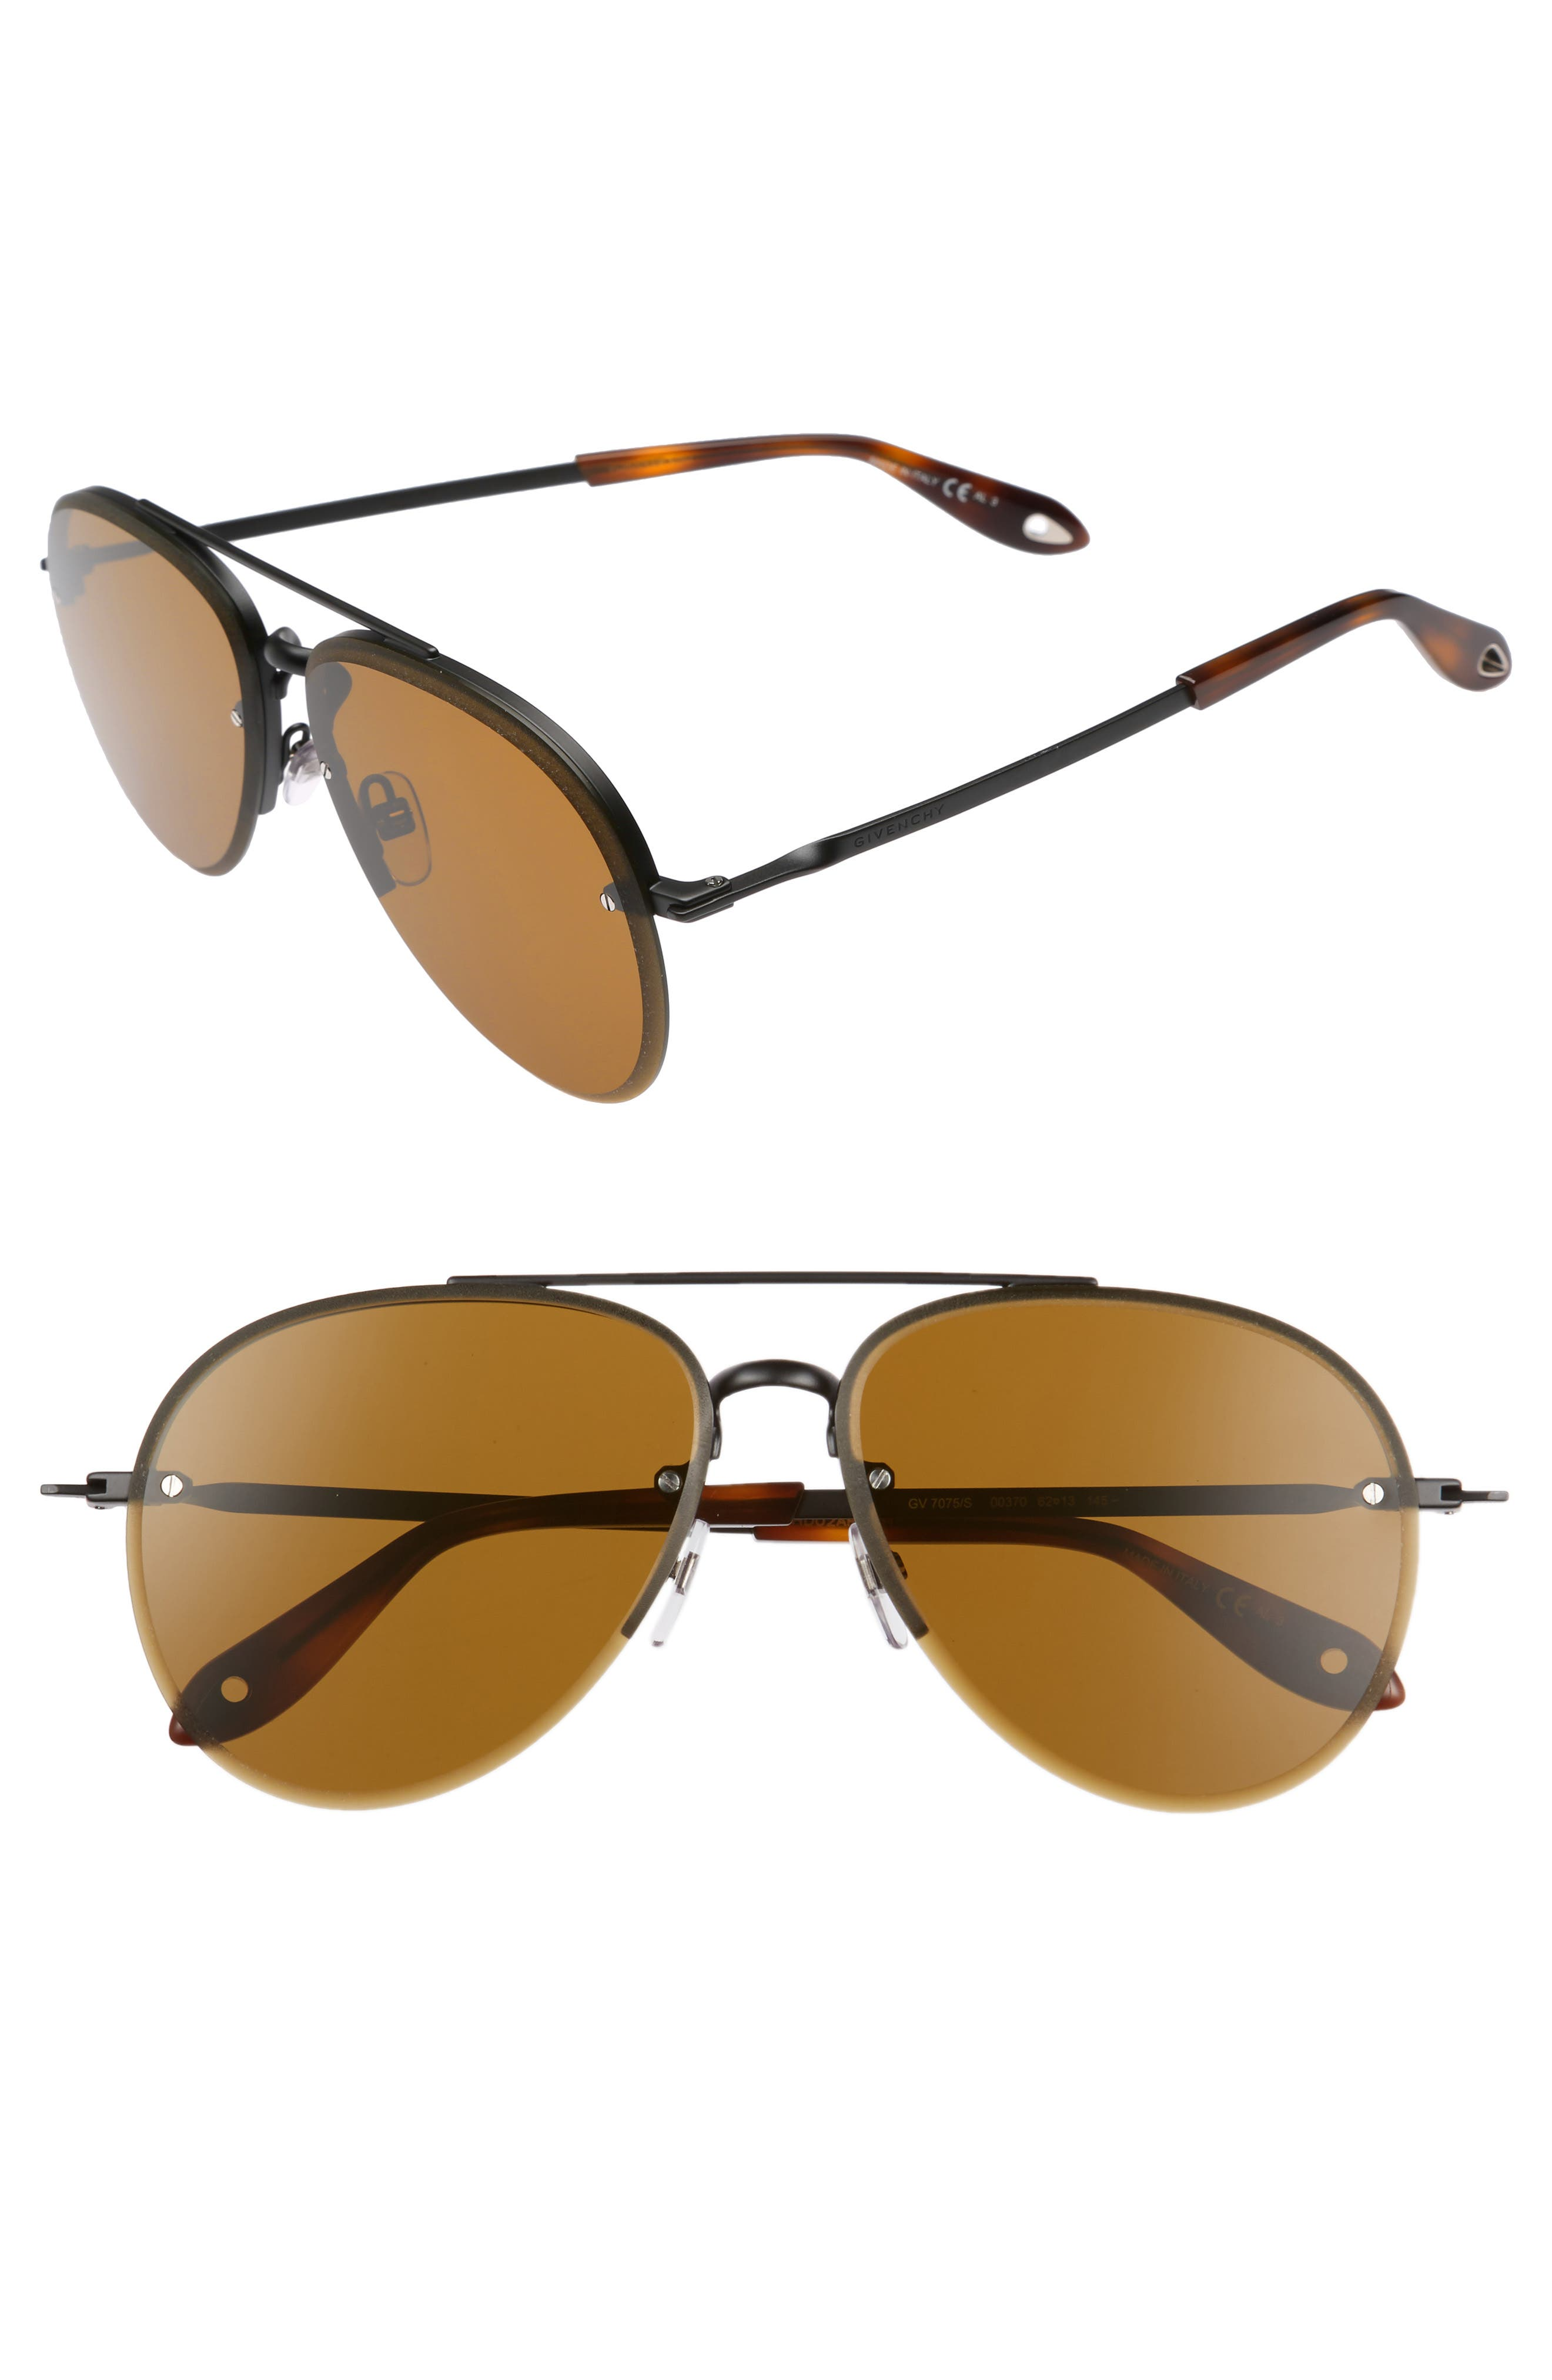 Givenchy 62Mm Oversize Aviator Sunglasses -